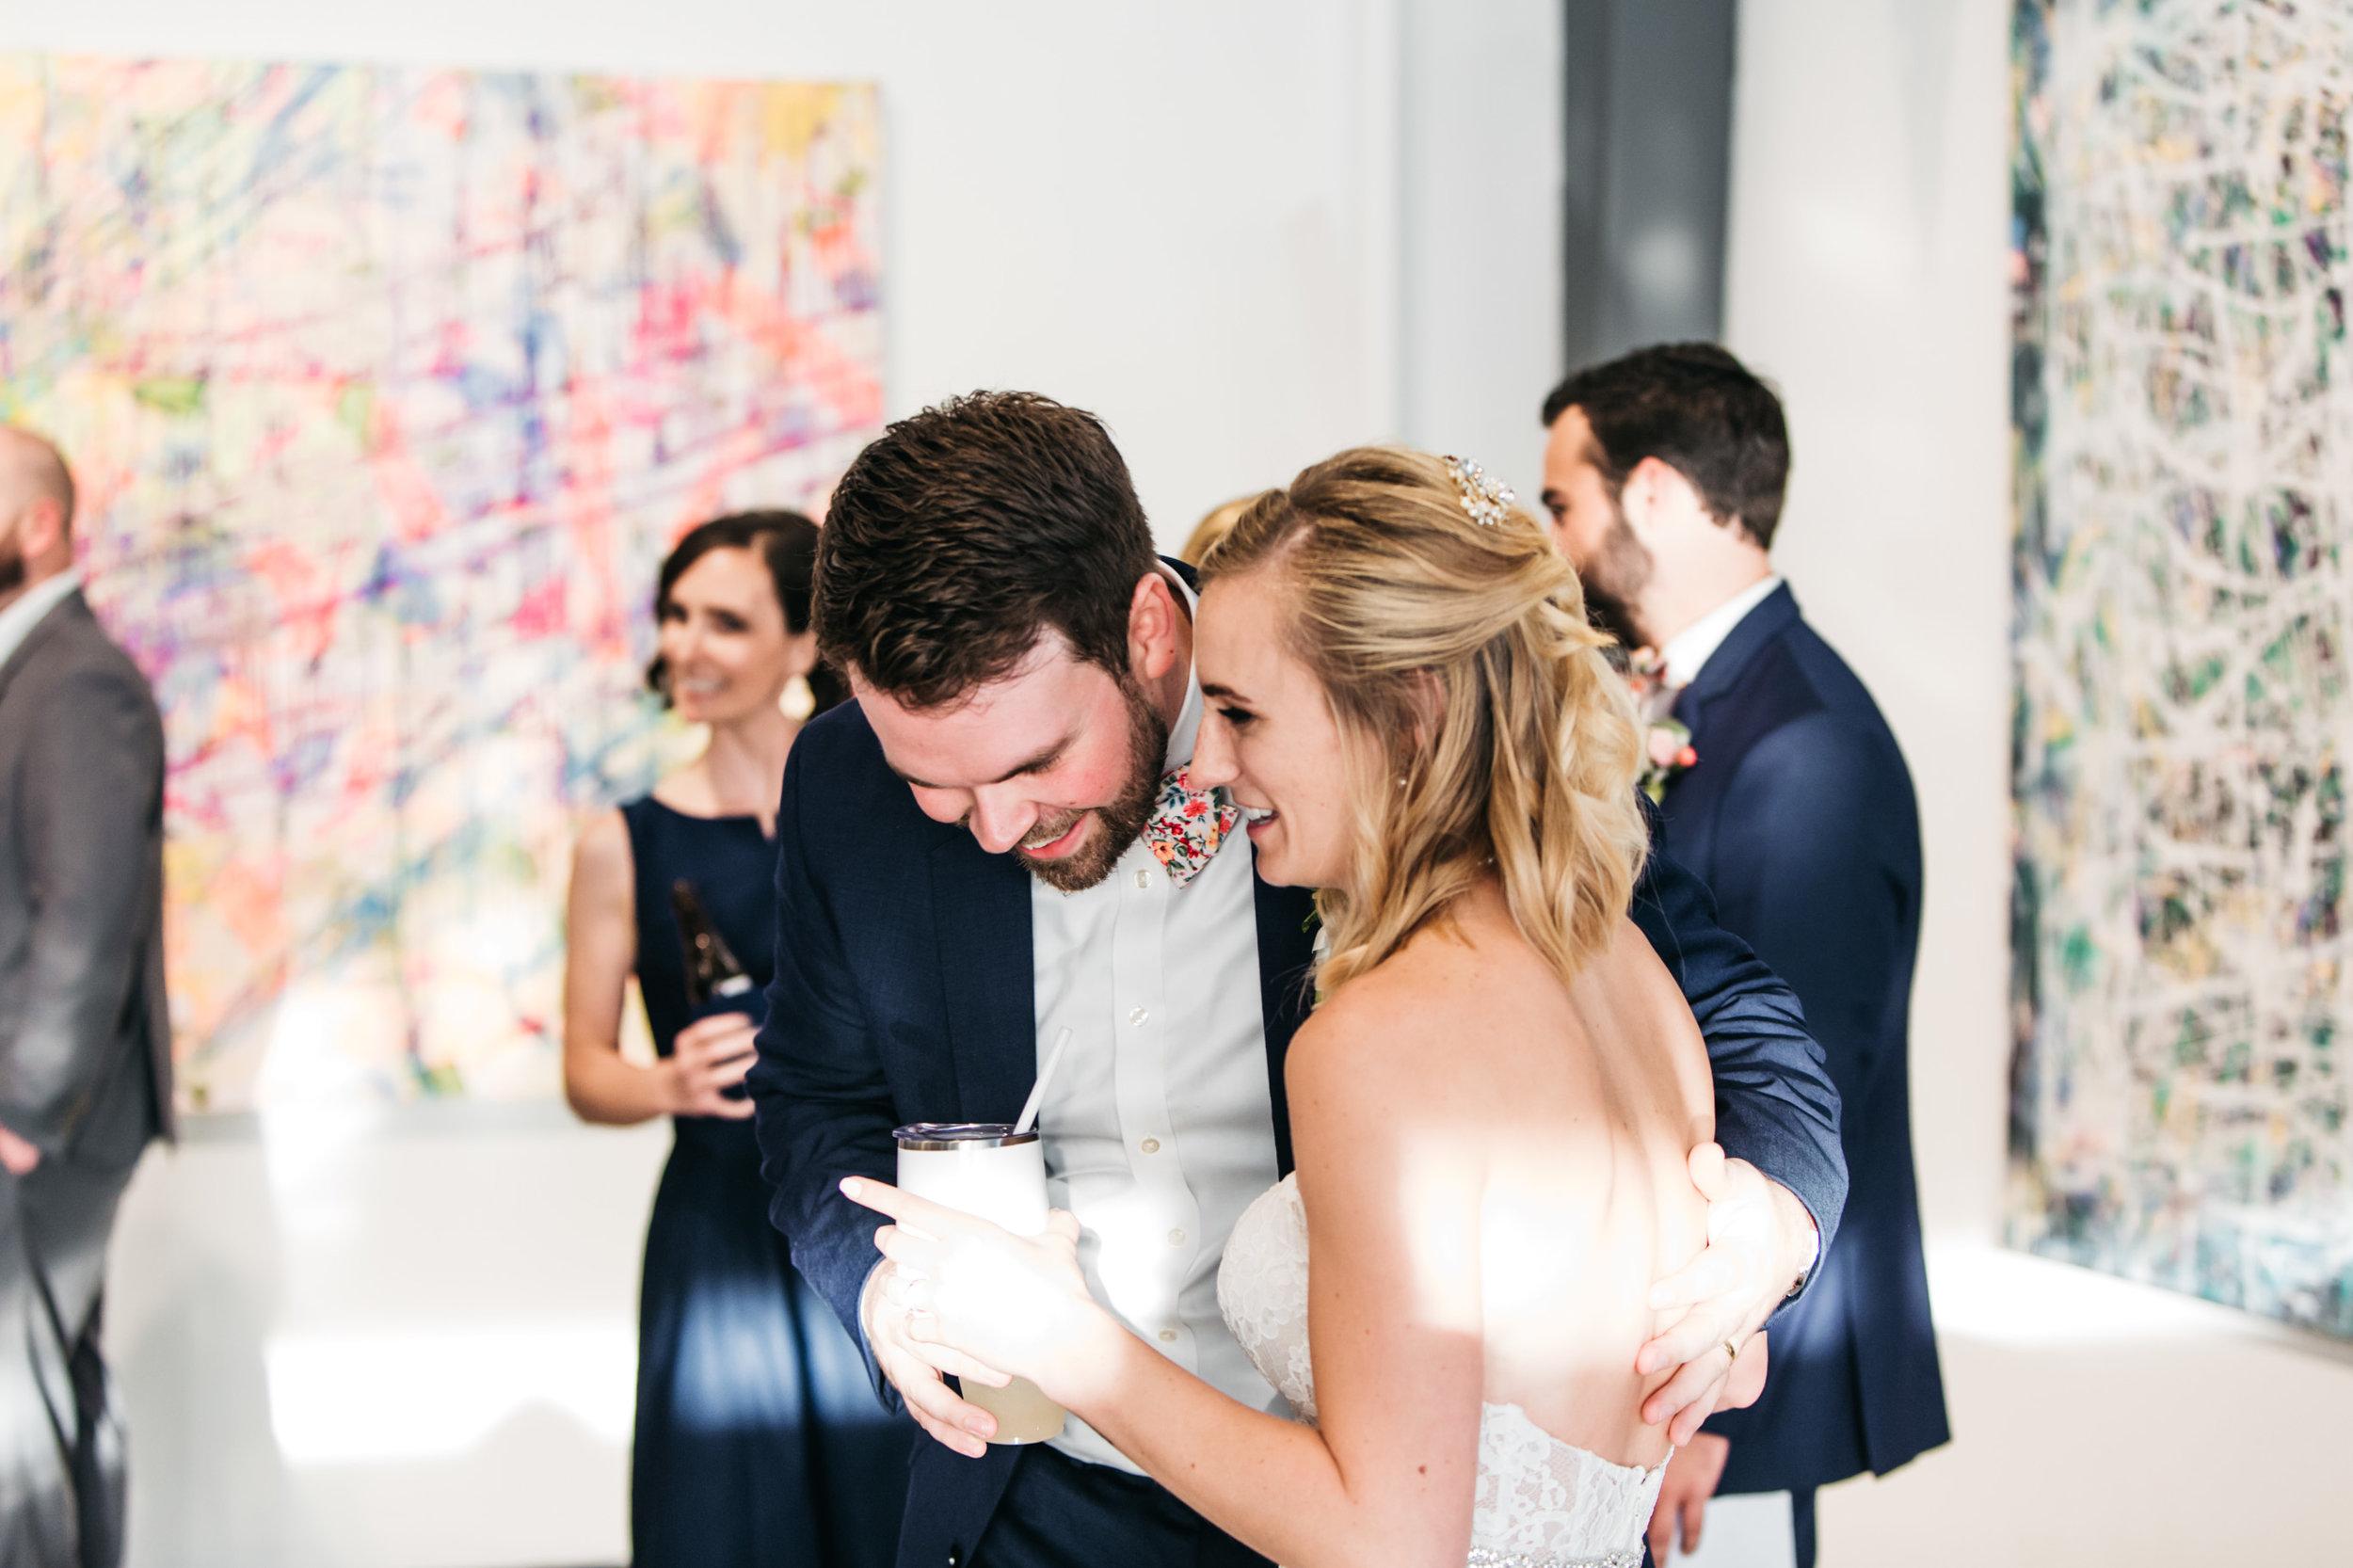 secret moments wedding couple